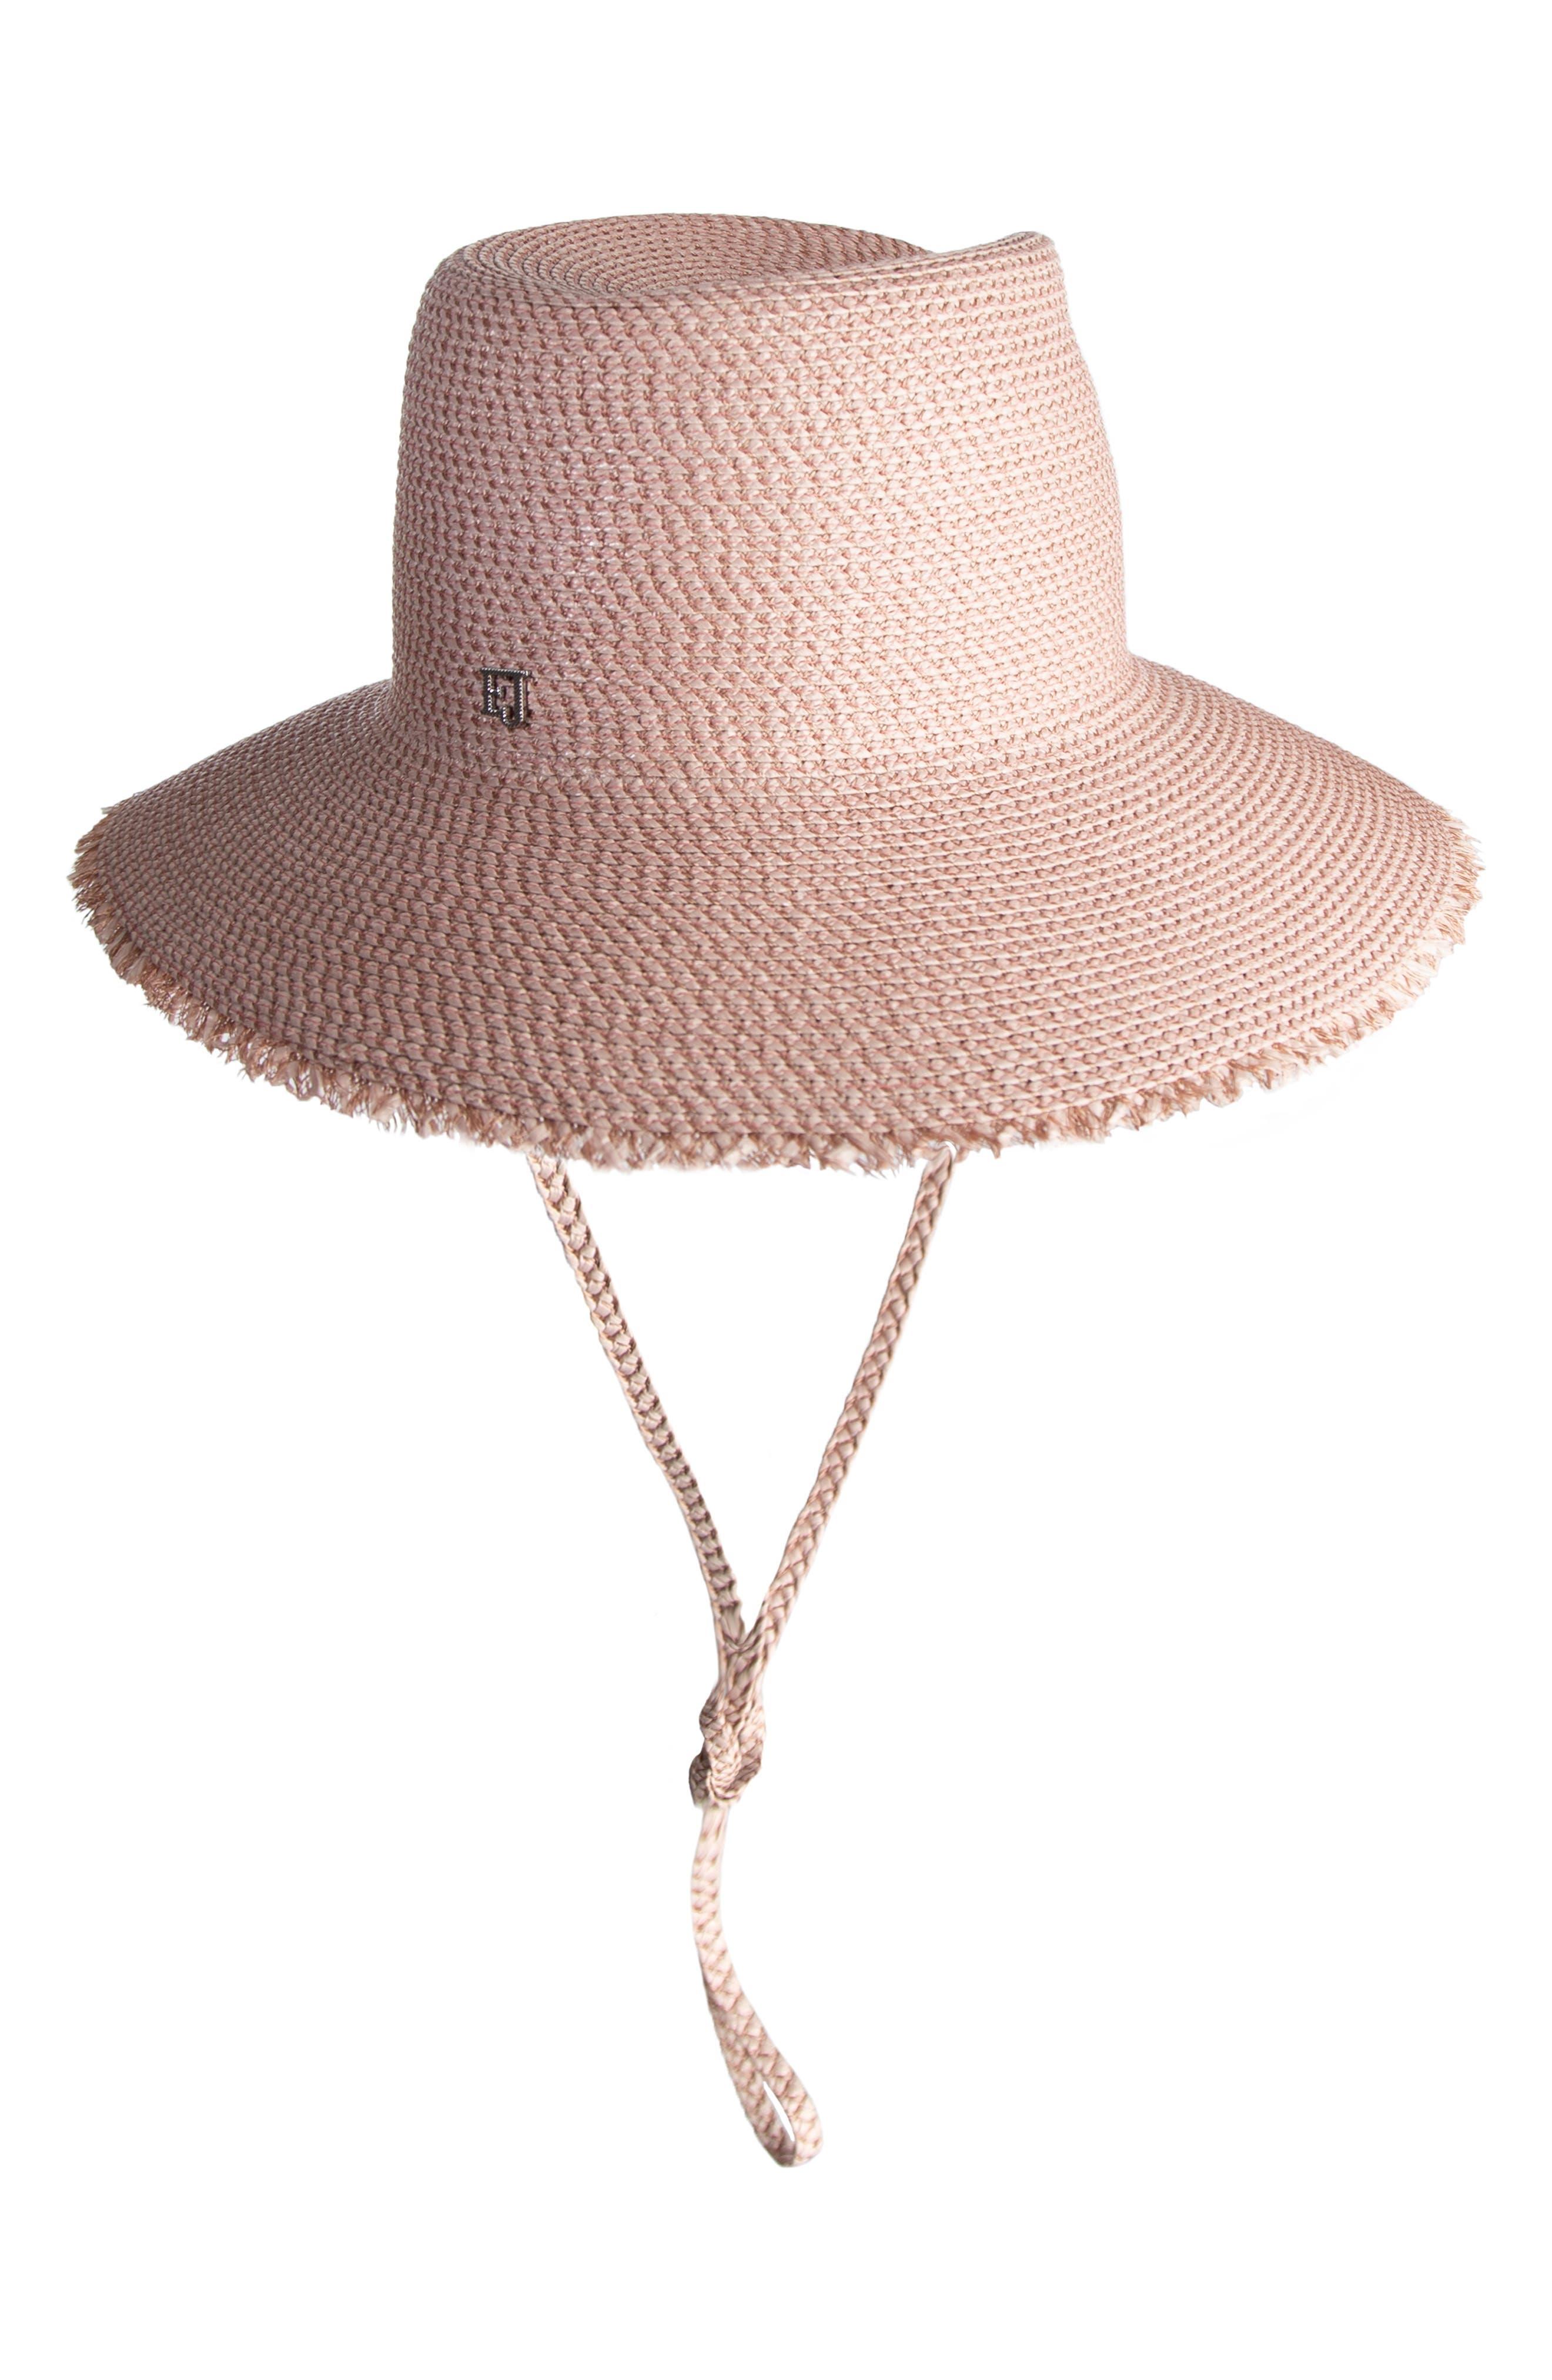 Suncoast Ii Woven Hat